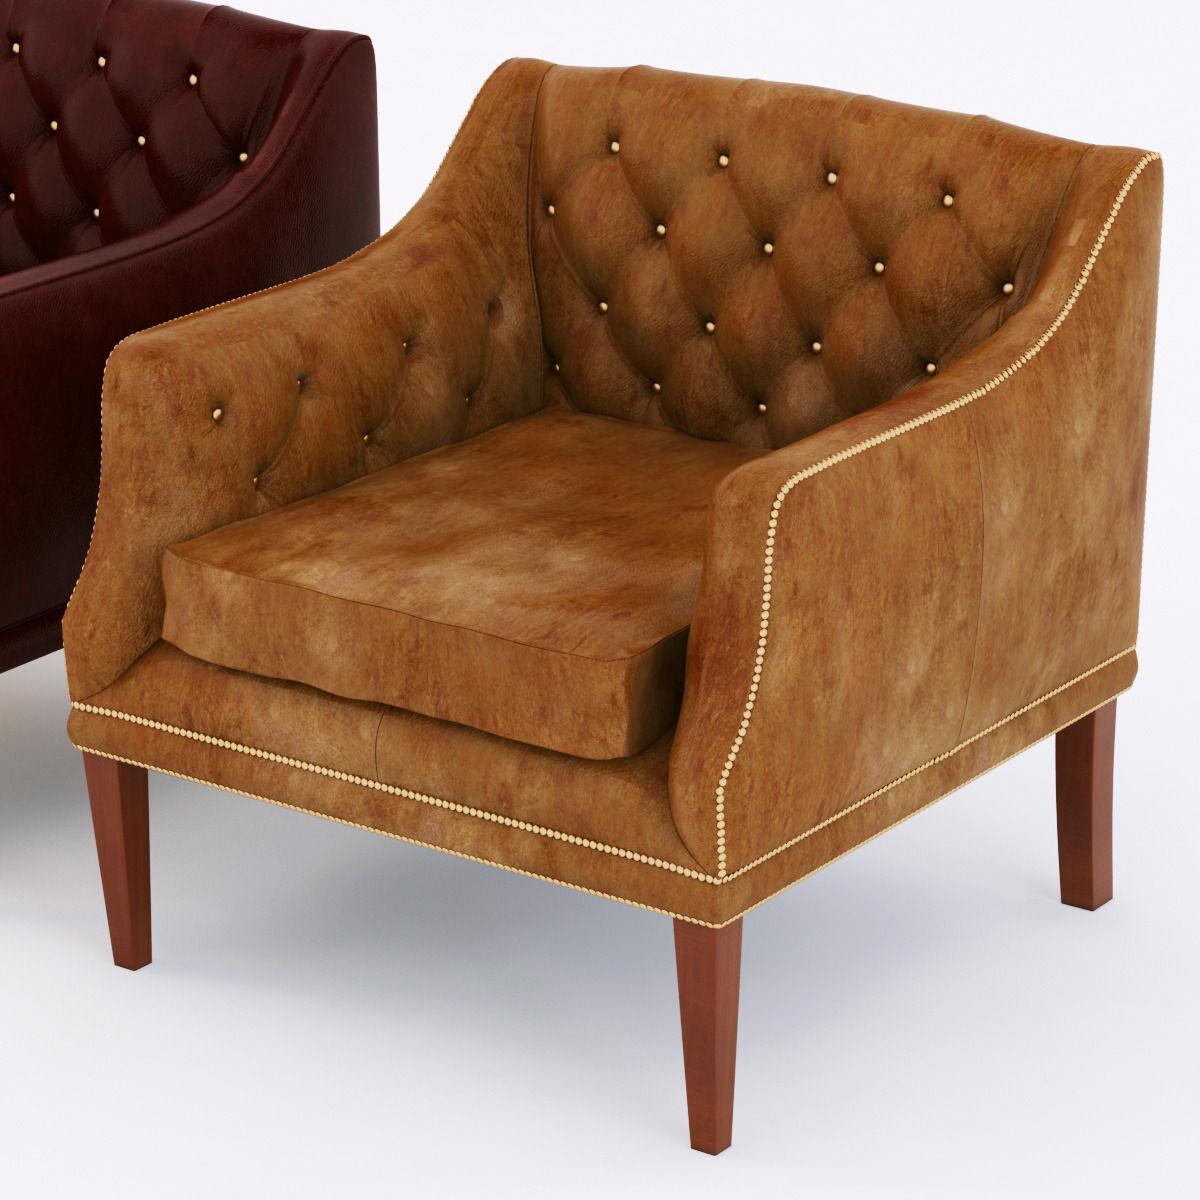 Hg eastbourne armchairs 3d model max obj fbx for Furniture now eastbourne